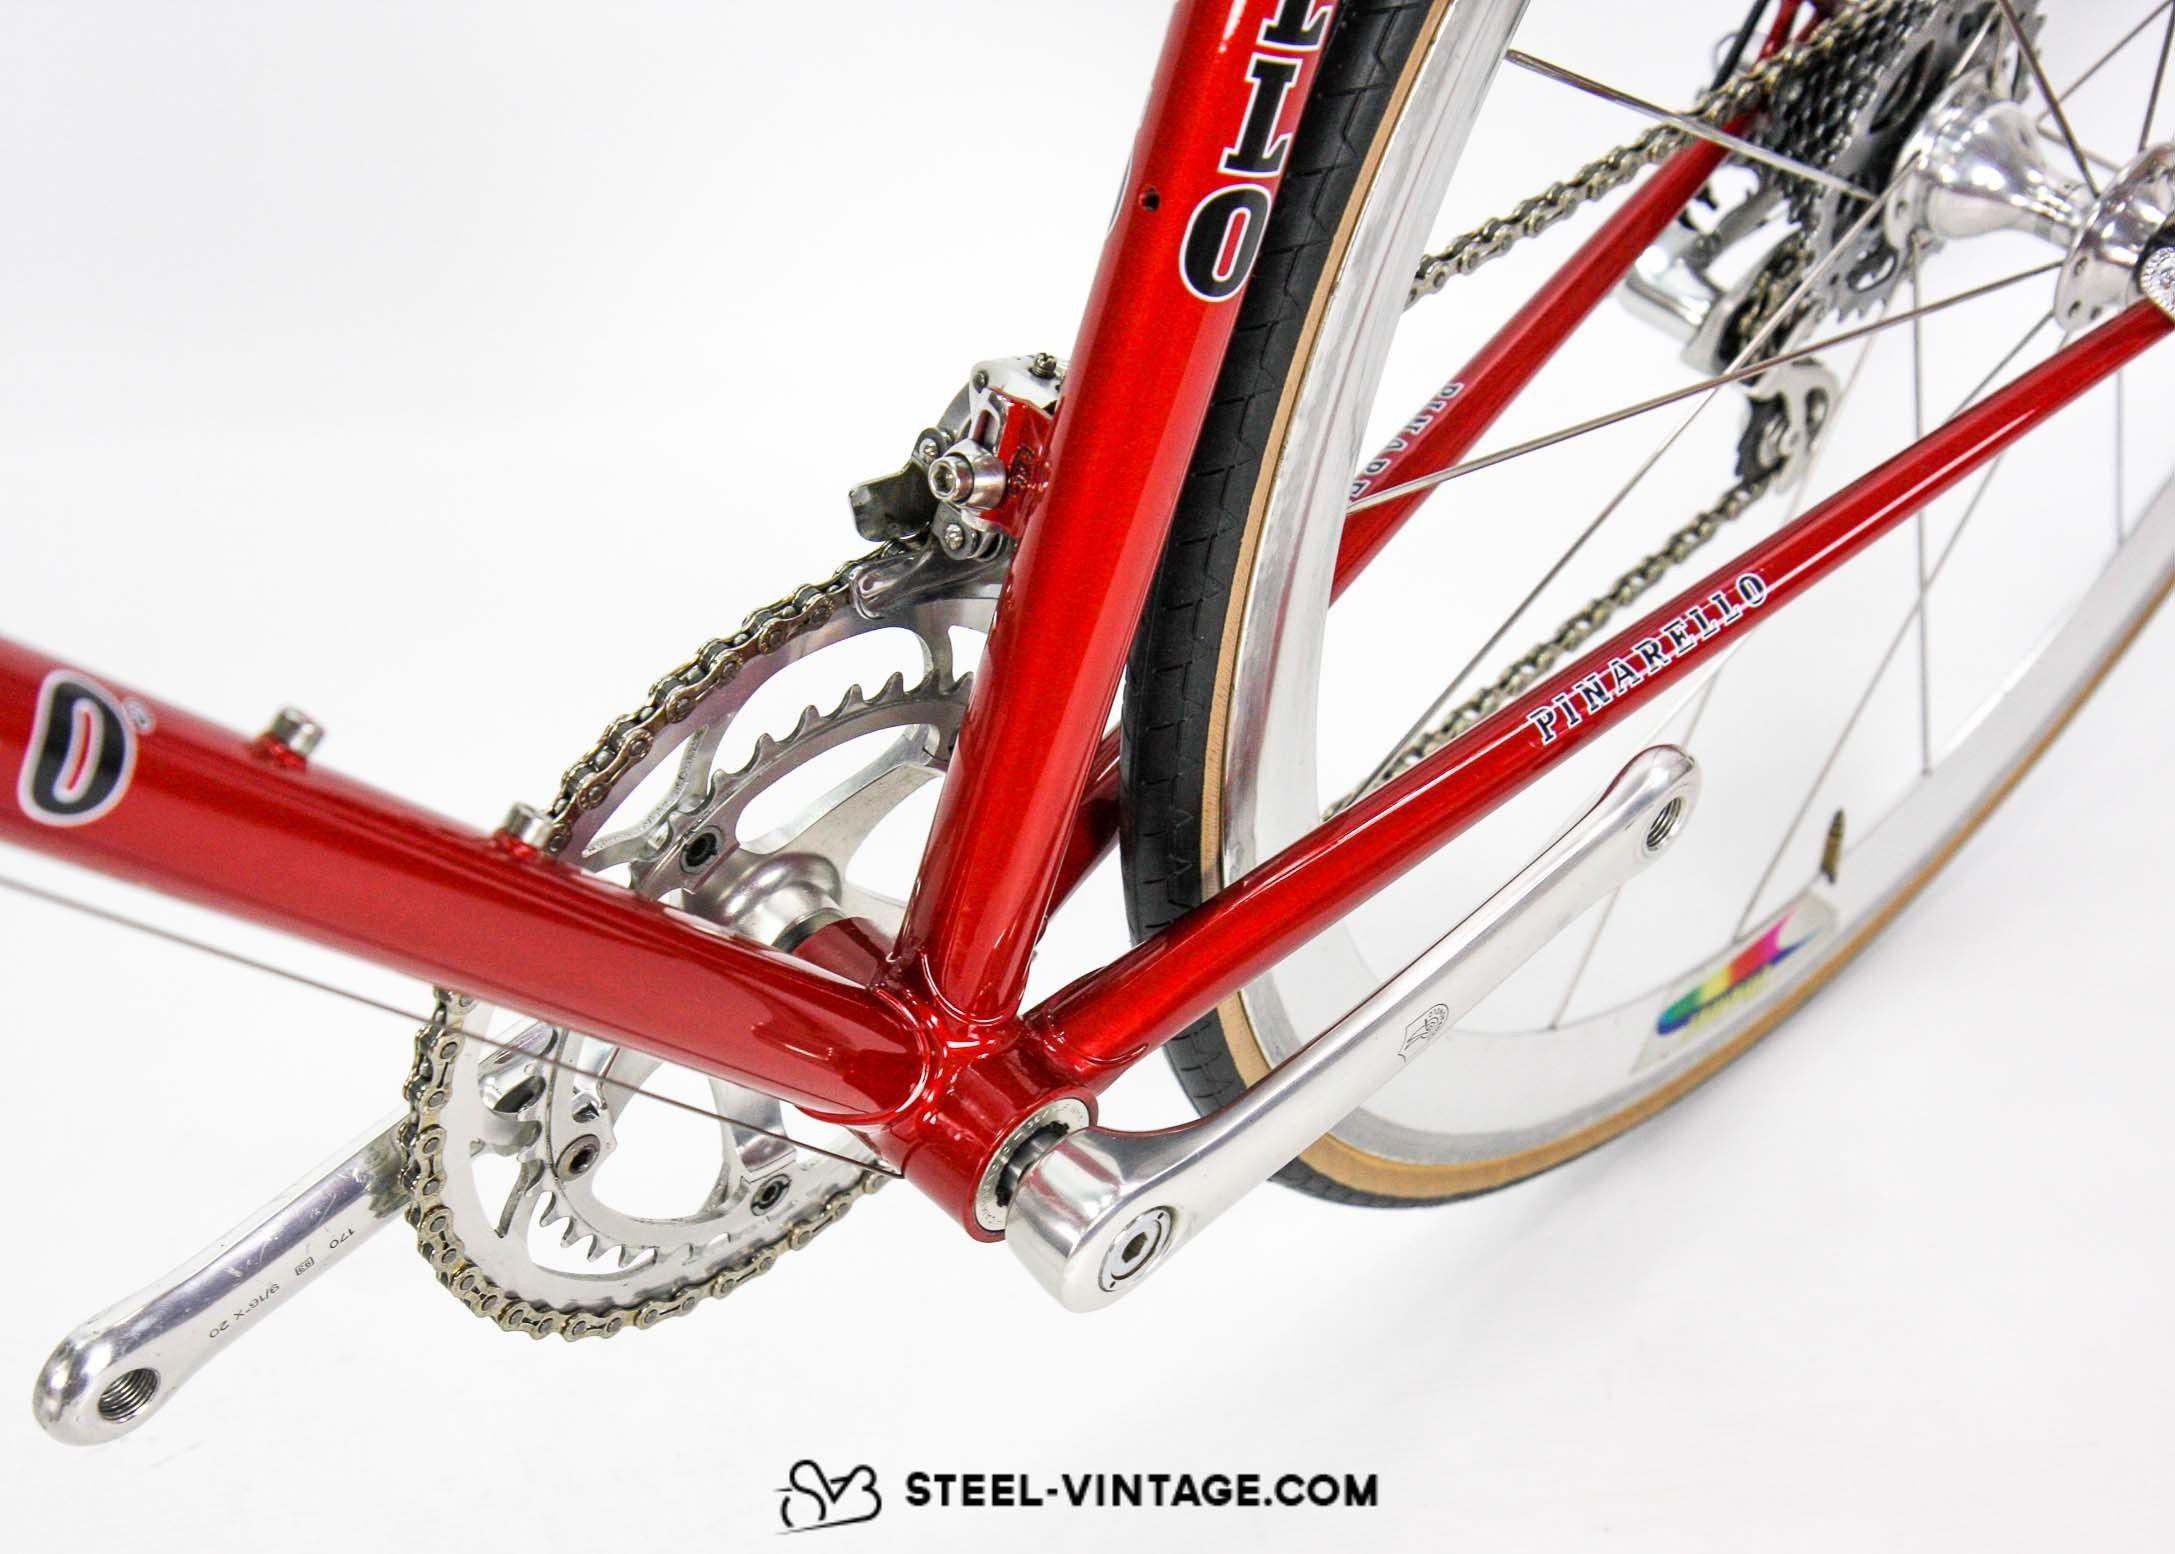 Steel Vintage Bikes Pinarello Asolo 1990s Road Bicycle Road Bicycle Bicycle Pinarello